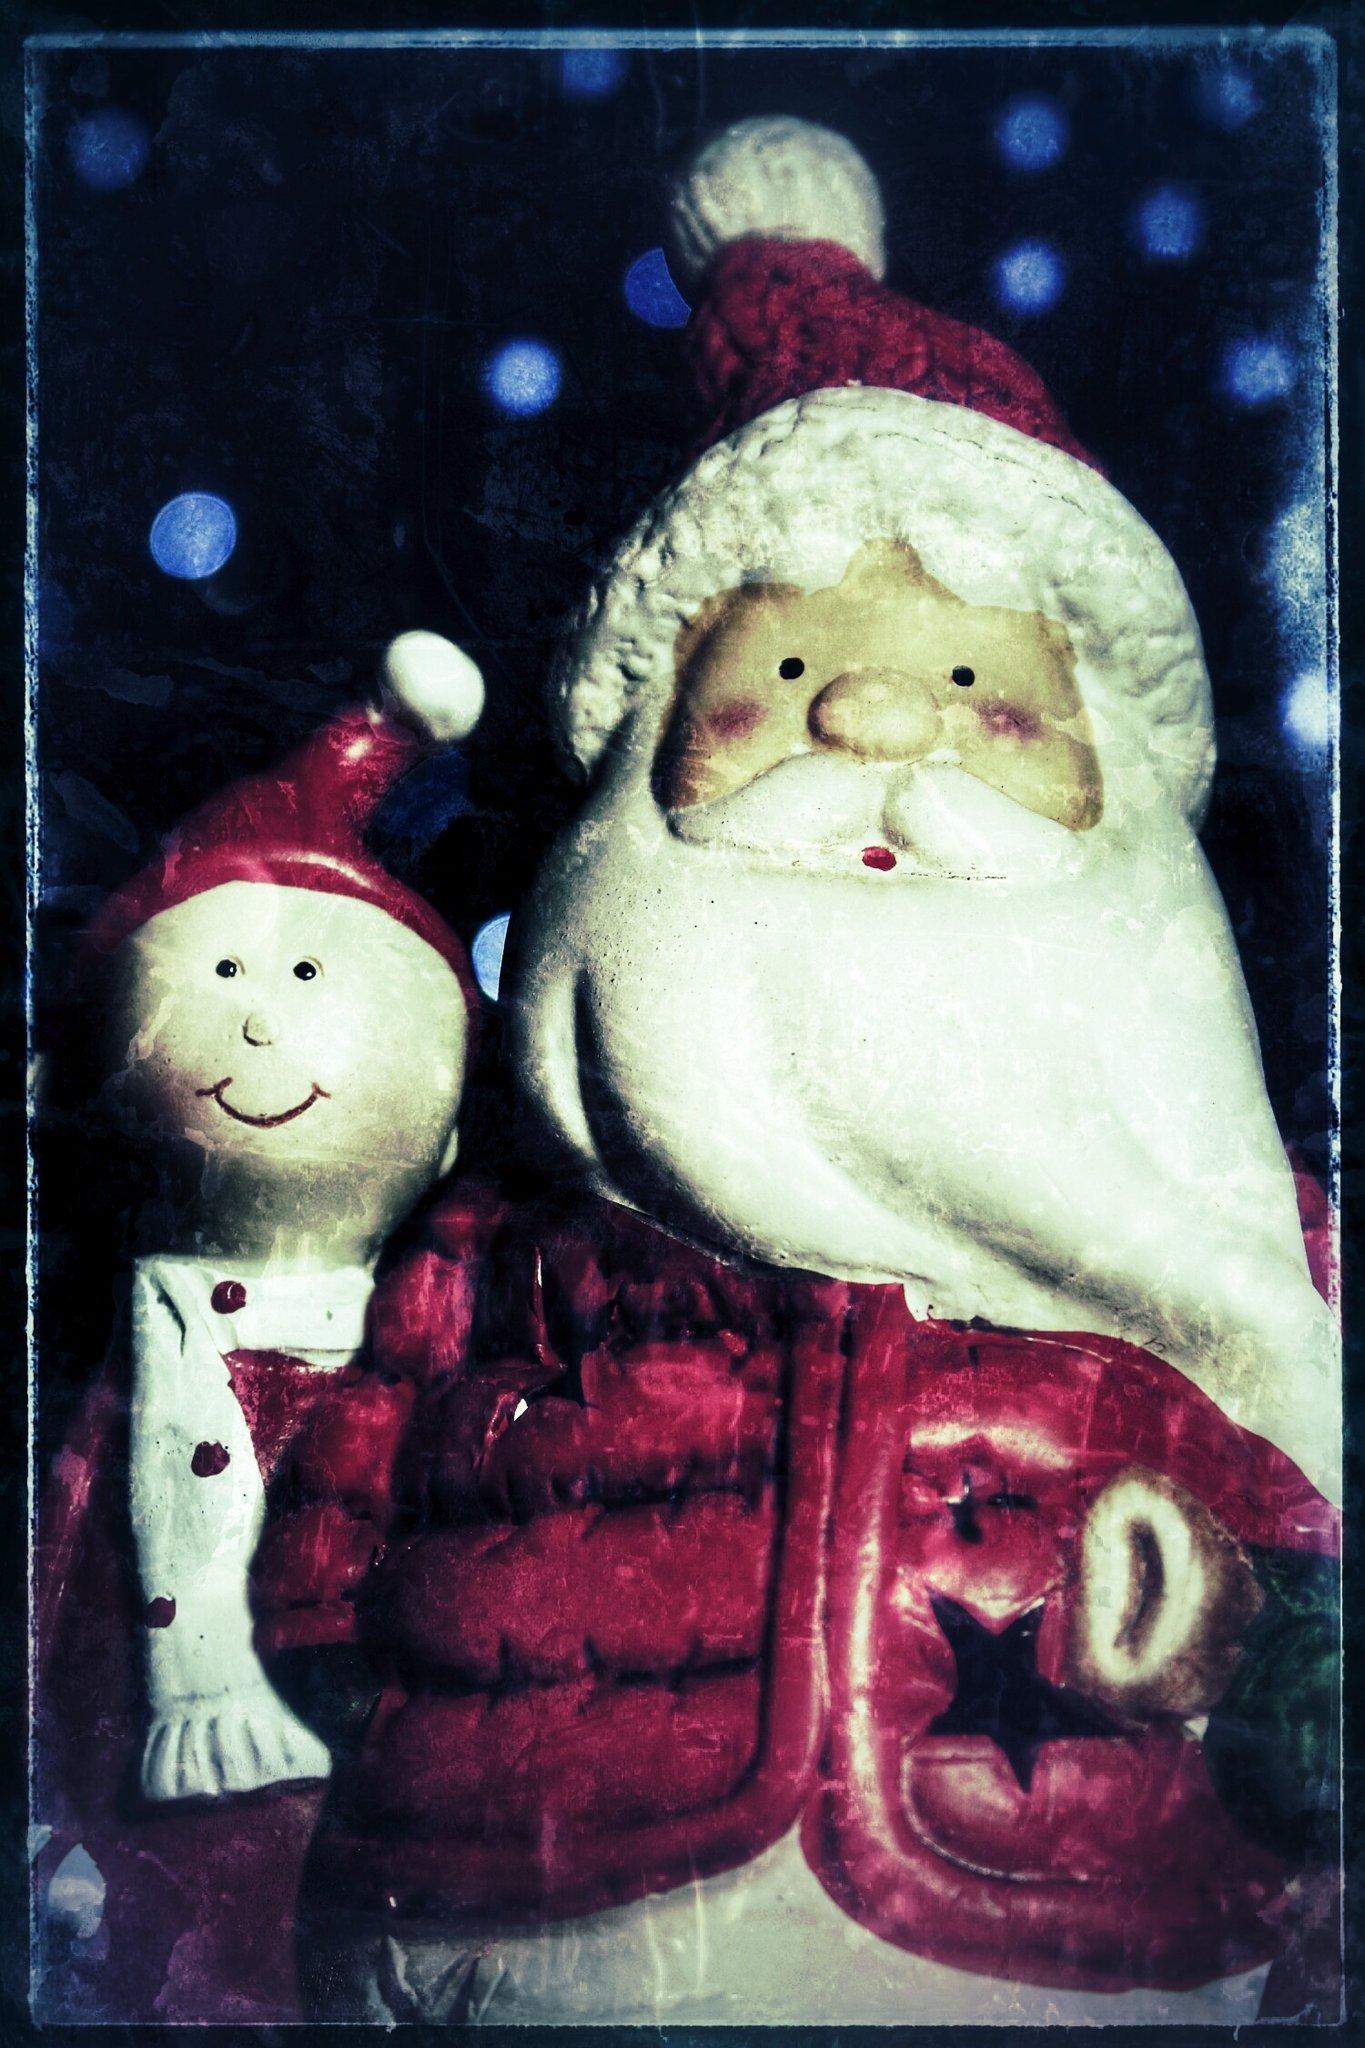 Wünsch Euch Allen Frohe Weihnachten.Wünsche Euch Allen Frohe Weihnachten